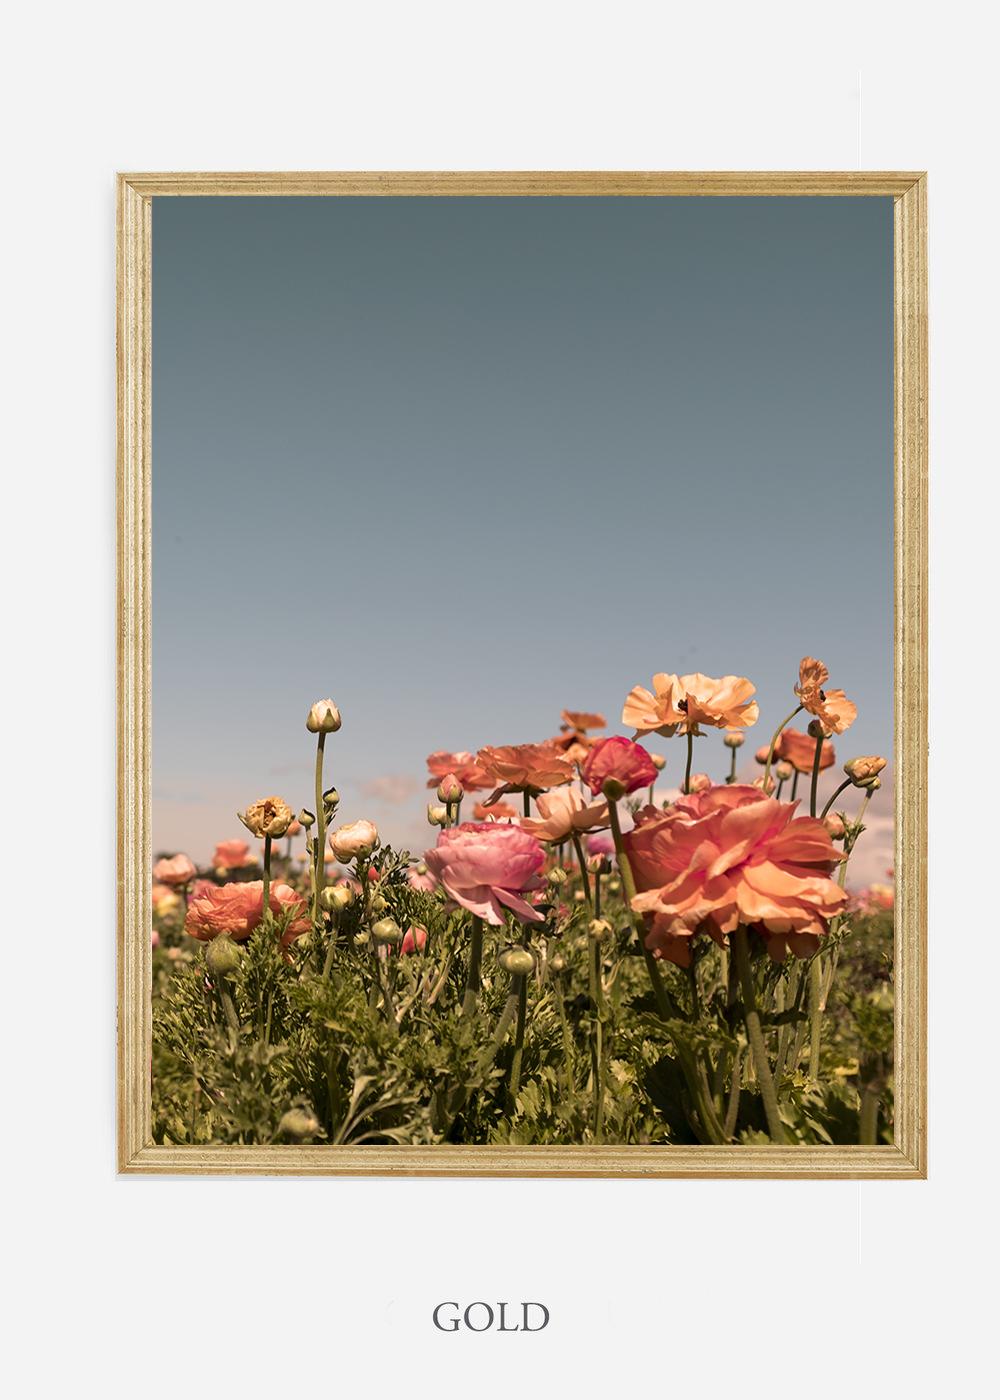 NoMat-Gold-Frame-Floral-No-1-Wilder-California-Art-Floral-Home-decor-Prints-Dahlia-Botanical-Artwork-Interior-design.jpg